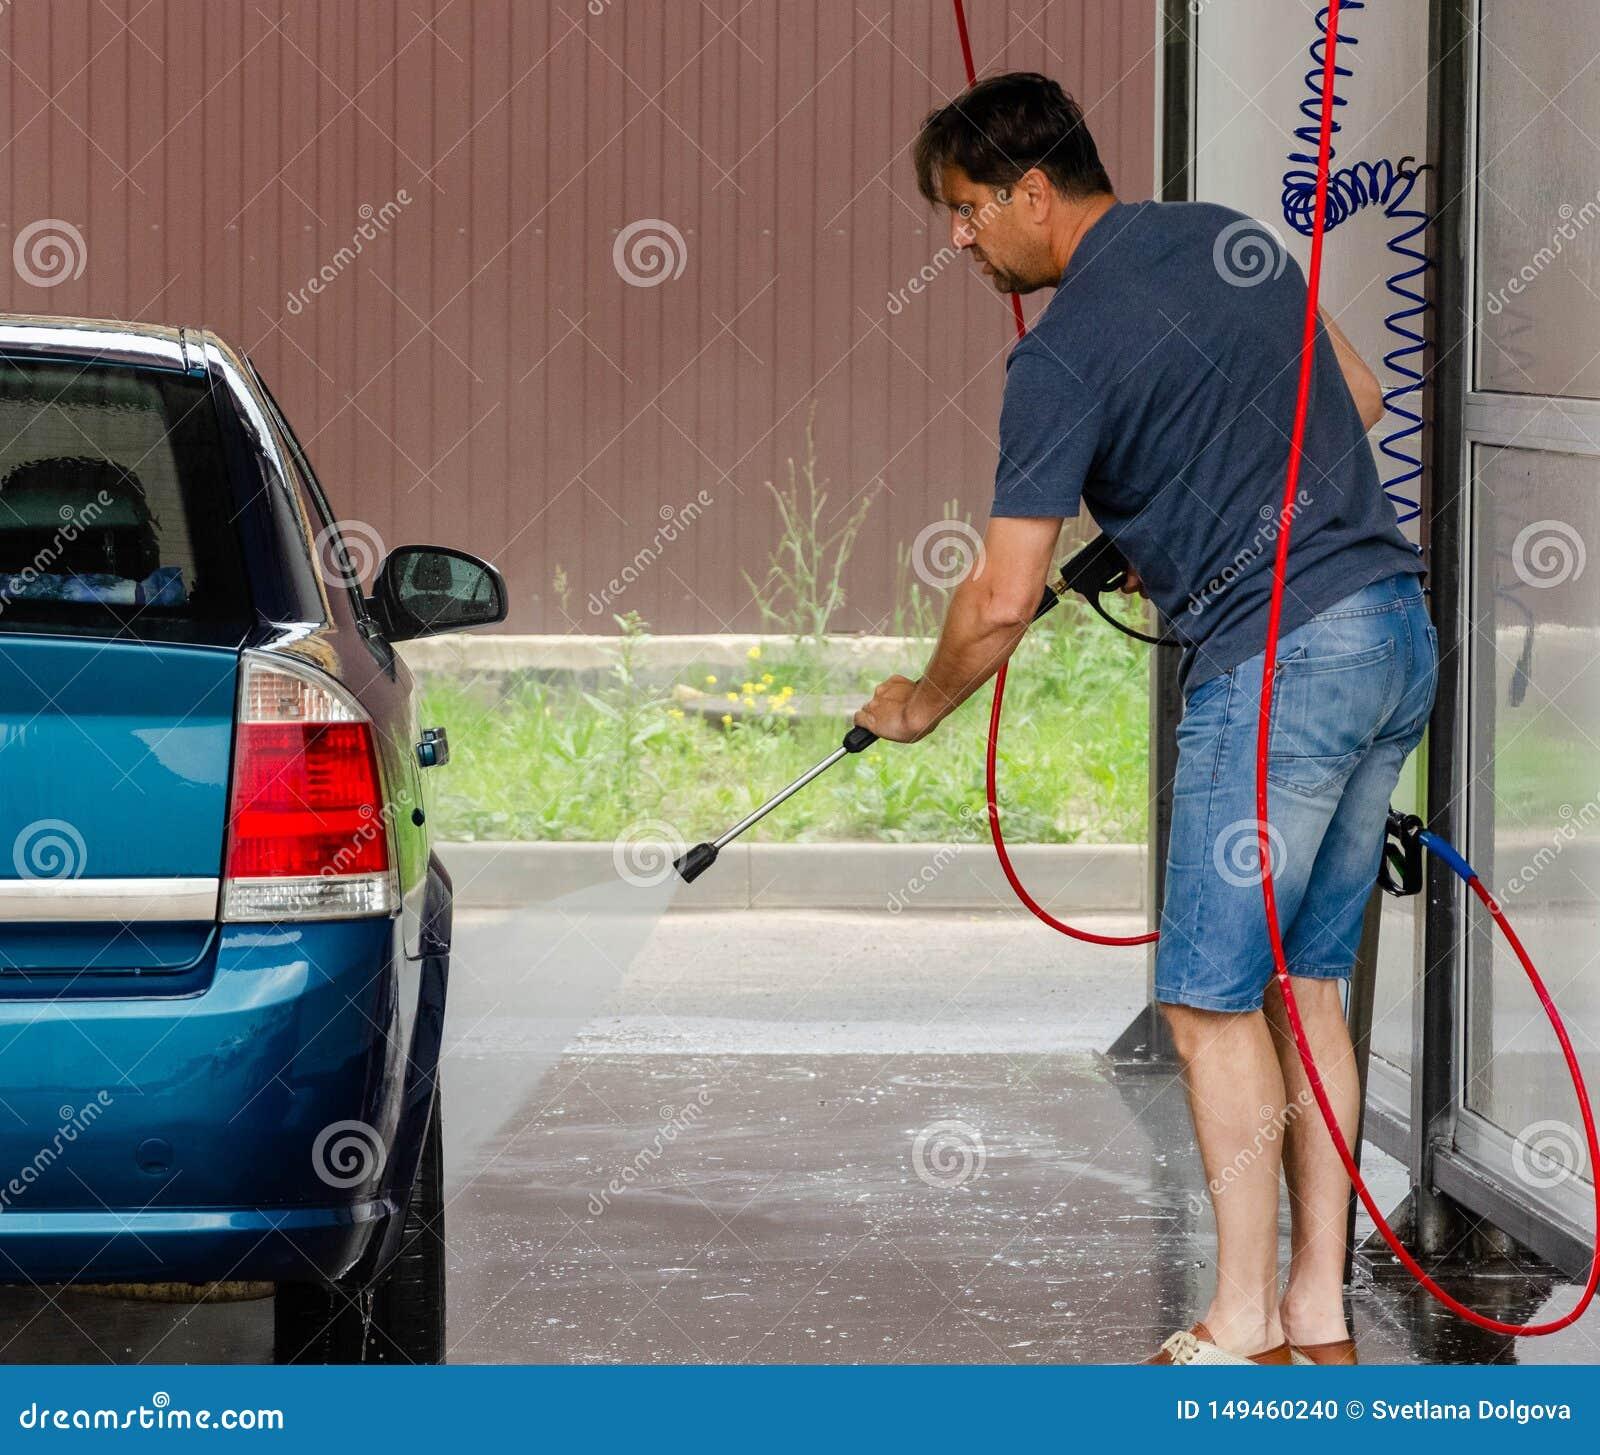 Car washing using high pressure water